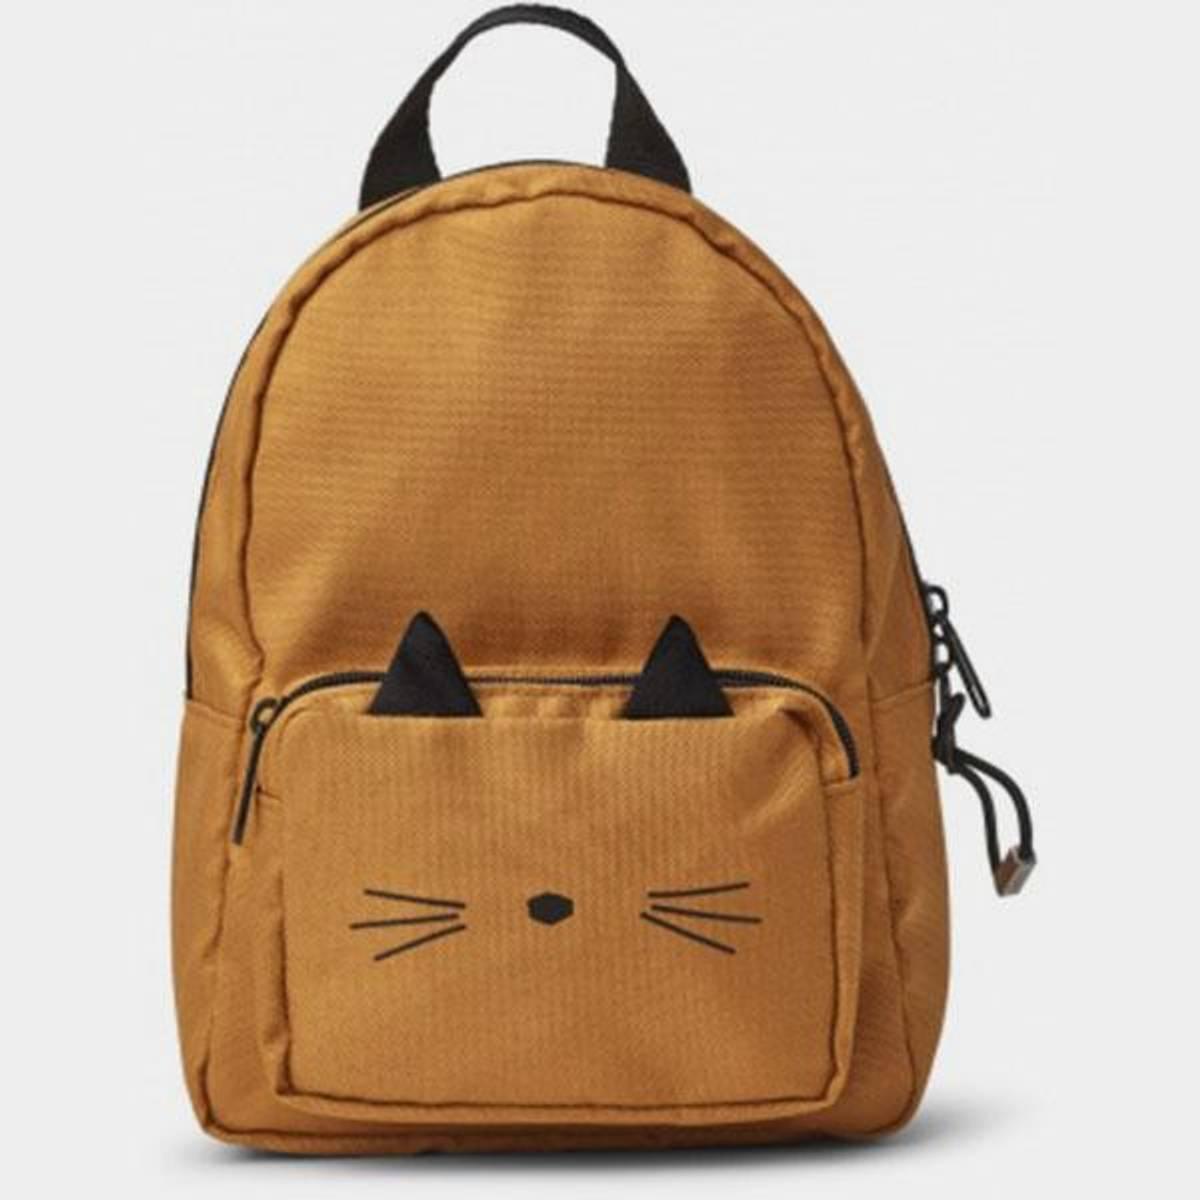 Ryggsekk Allan Backpack Cat Mustard